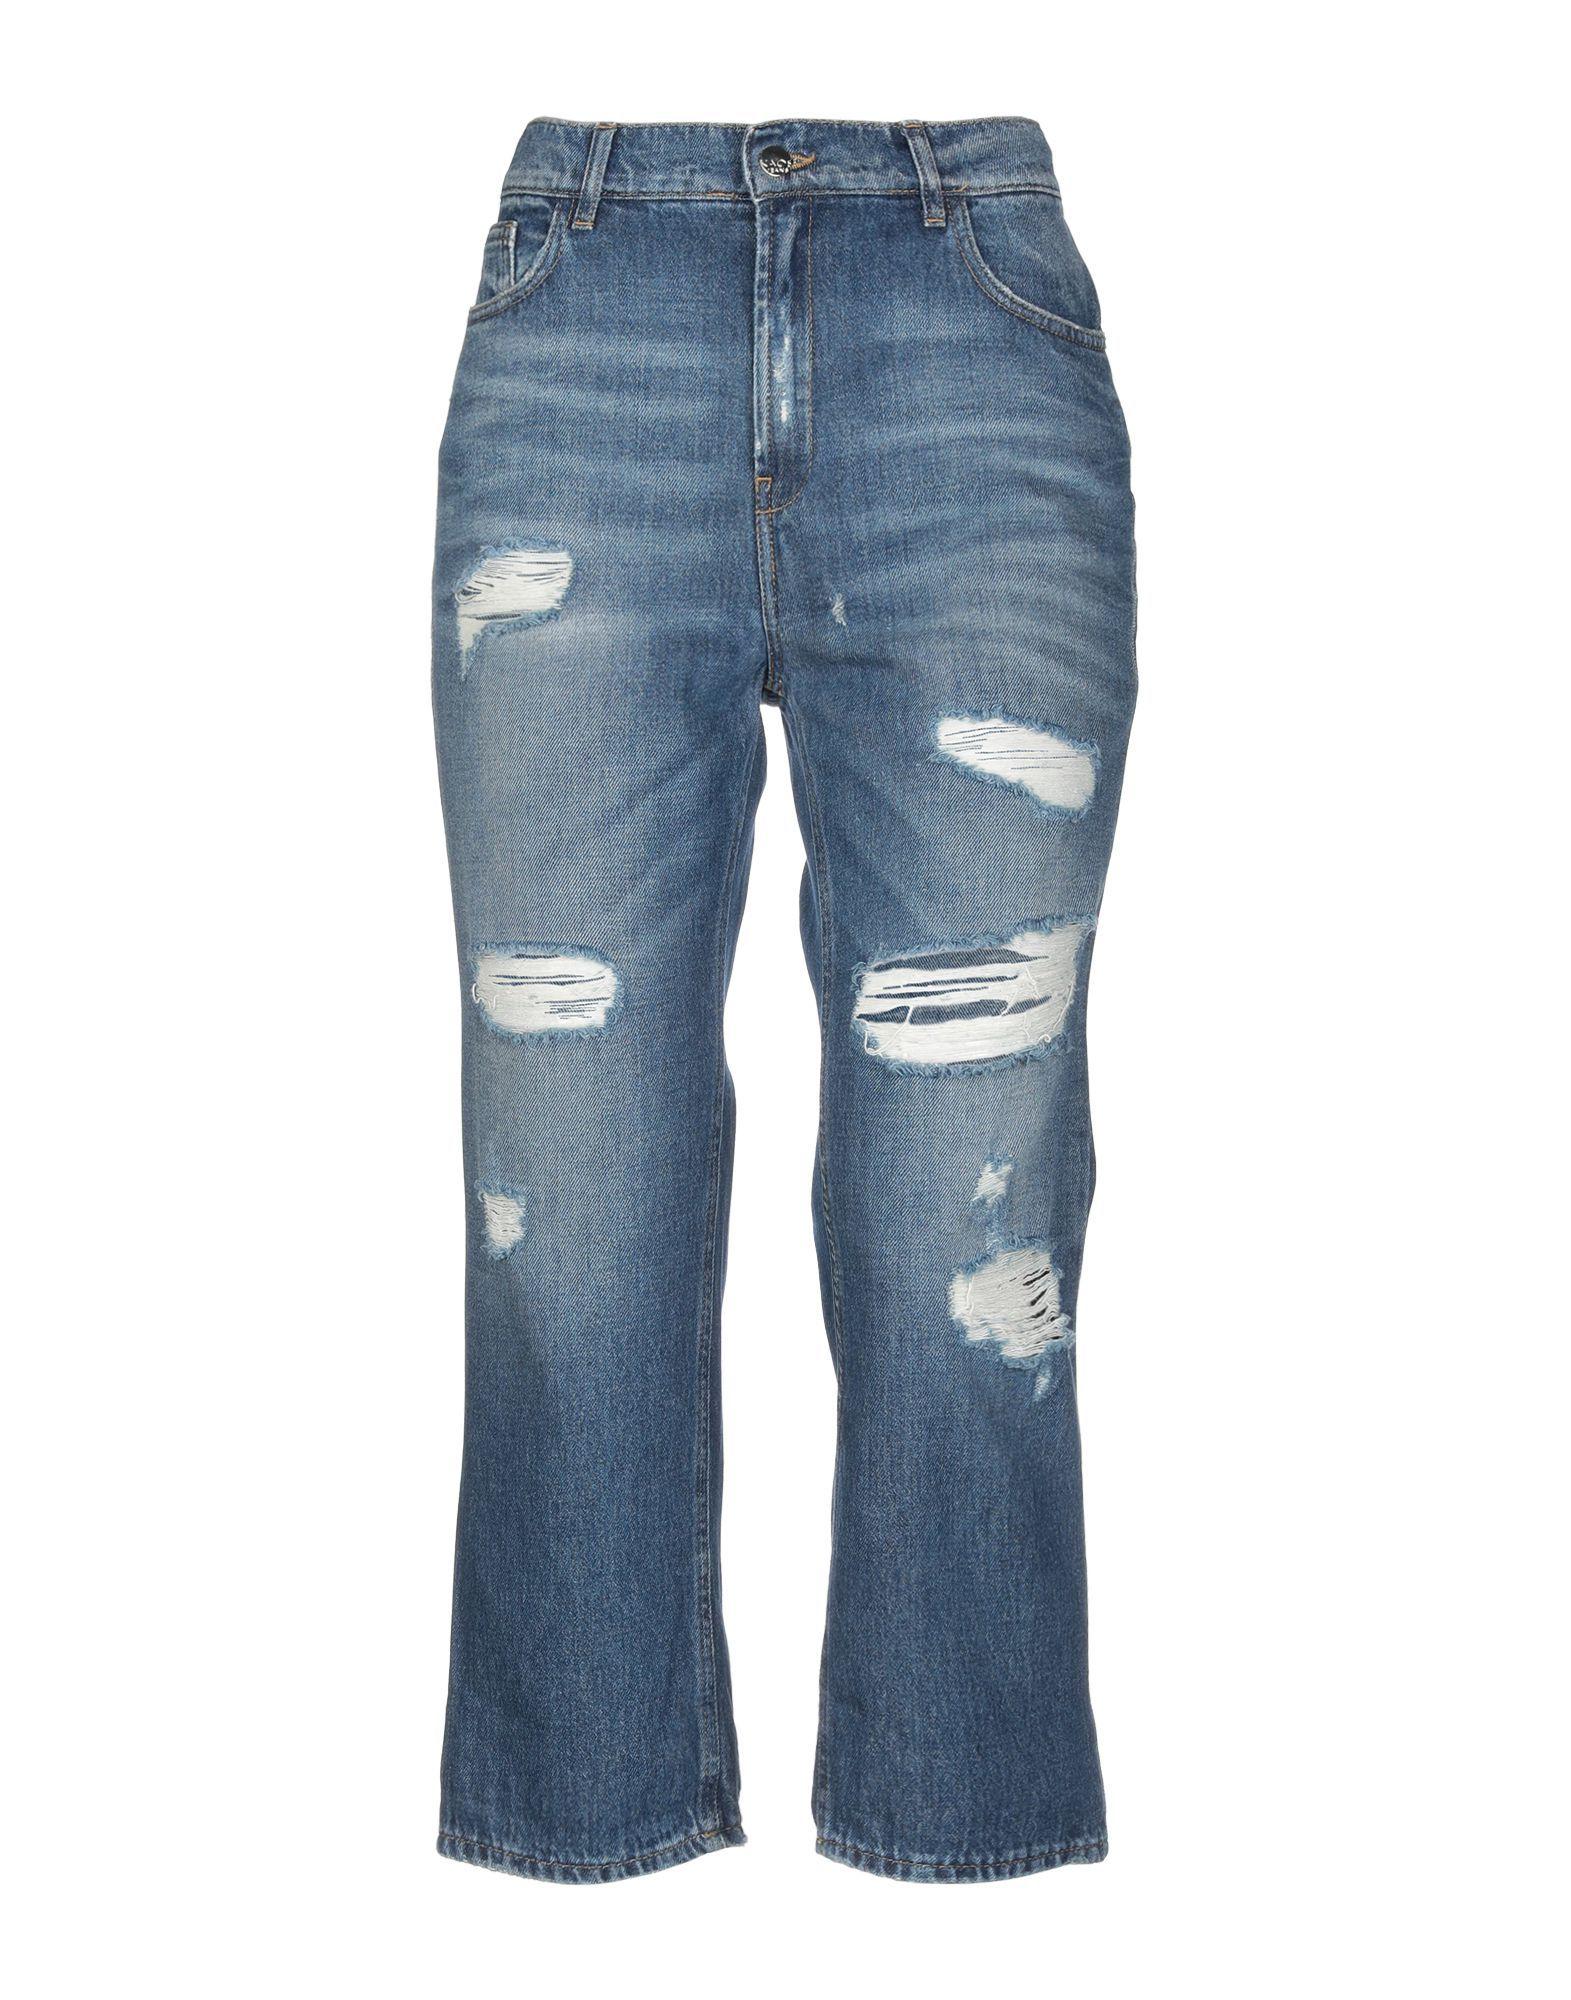 Kaos Jeans Blue Cotton Distressed Jeans